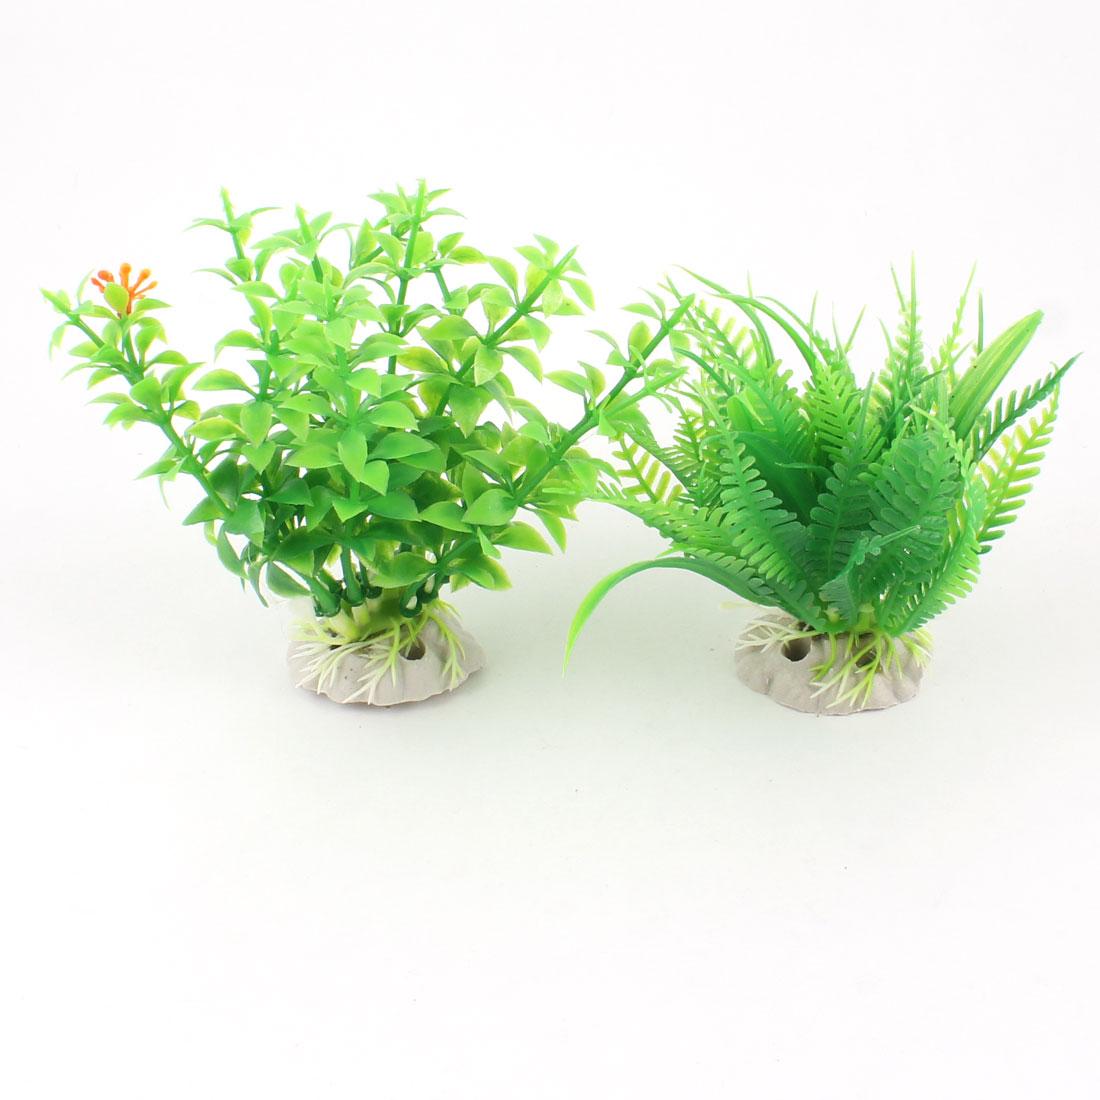 "2 Pcs 4.3"" Height Artificial Fish Tank Aquarium Plants Green w Ceramic Base"